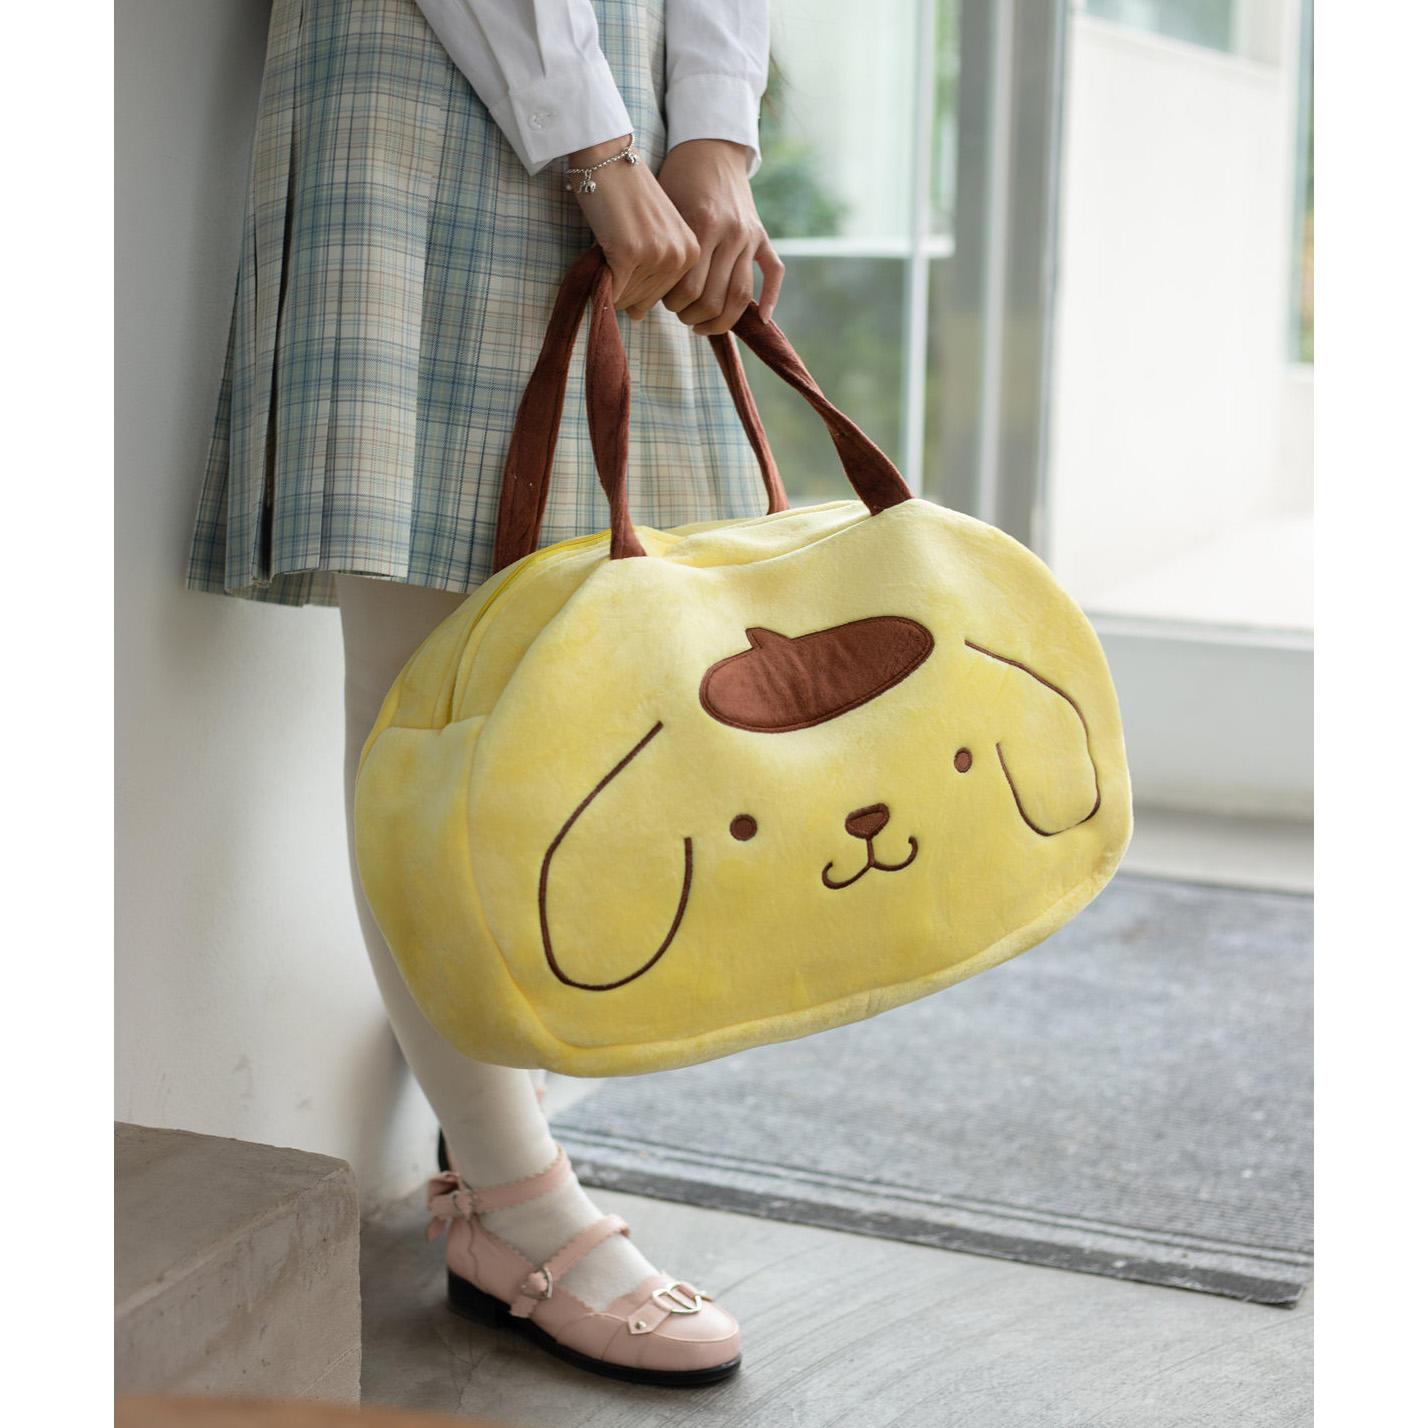 Plush Shoulder Bags Animal Women's Plush Bag shoulder High Capacity Portable Cartoon Bag For Shopping cute Handbag